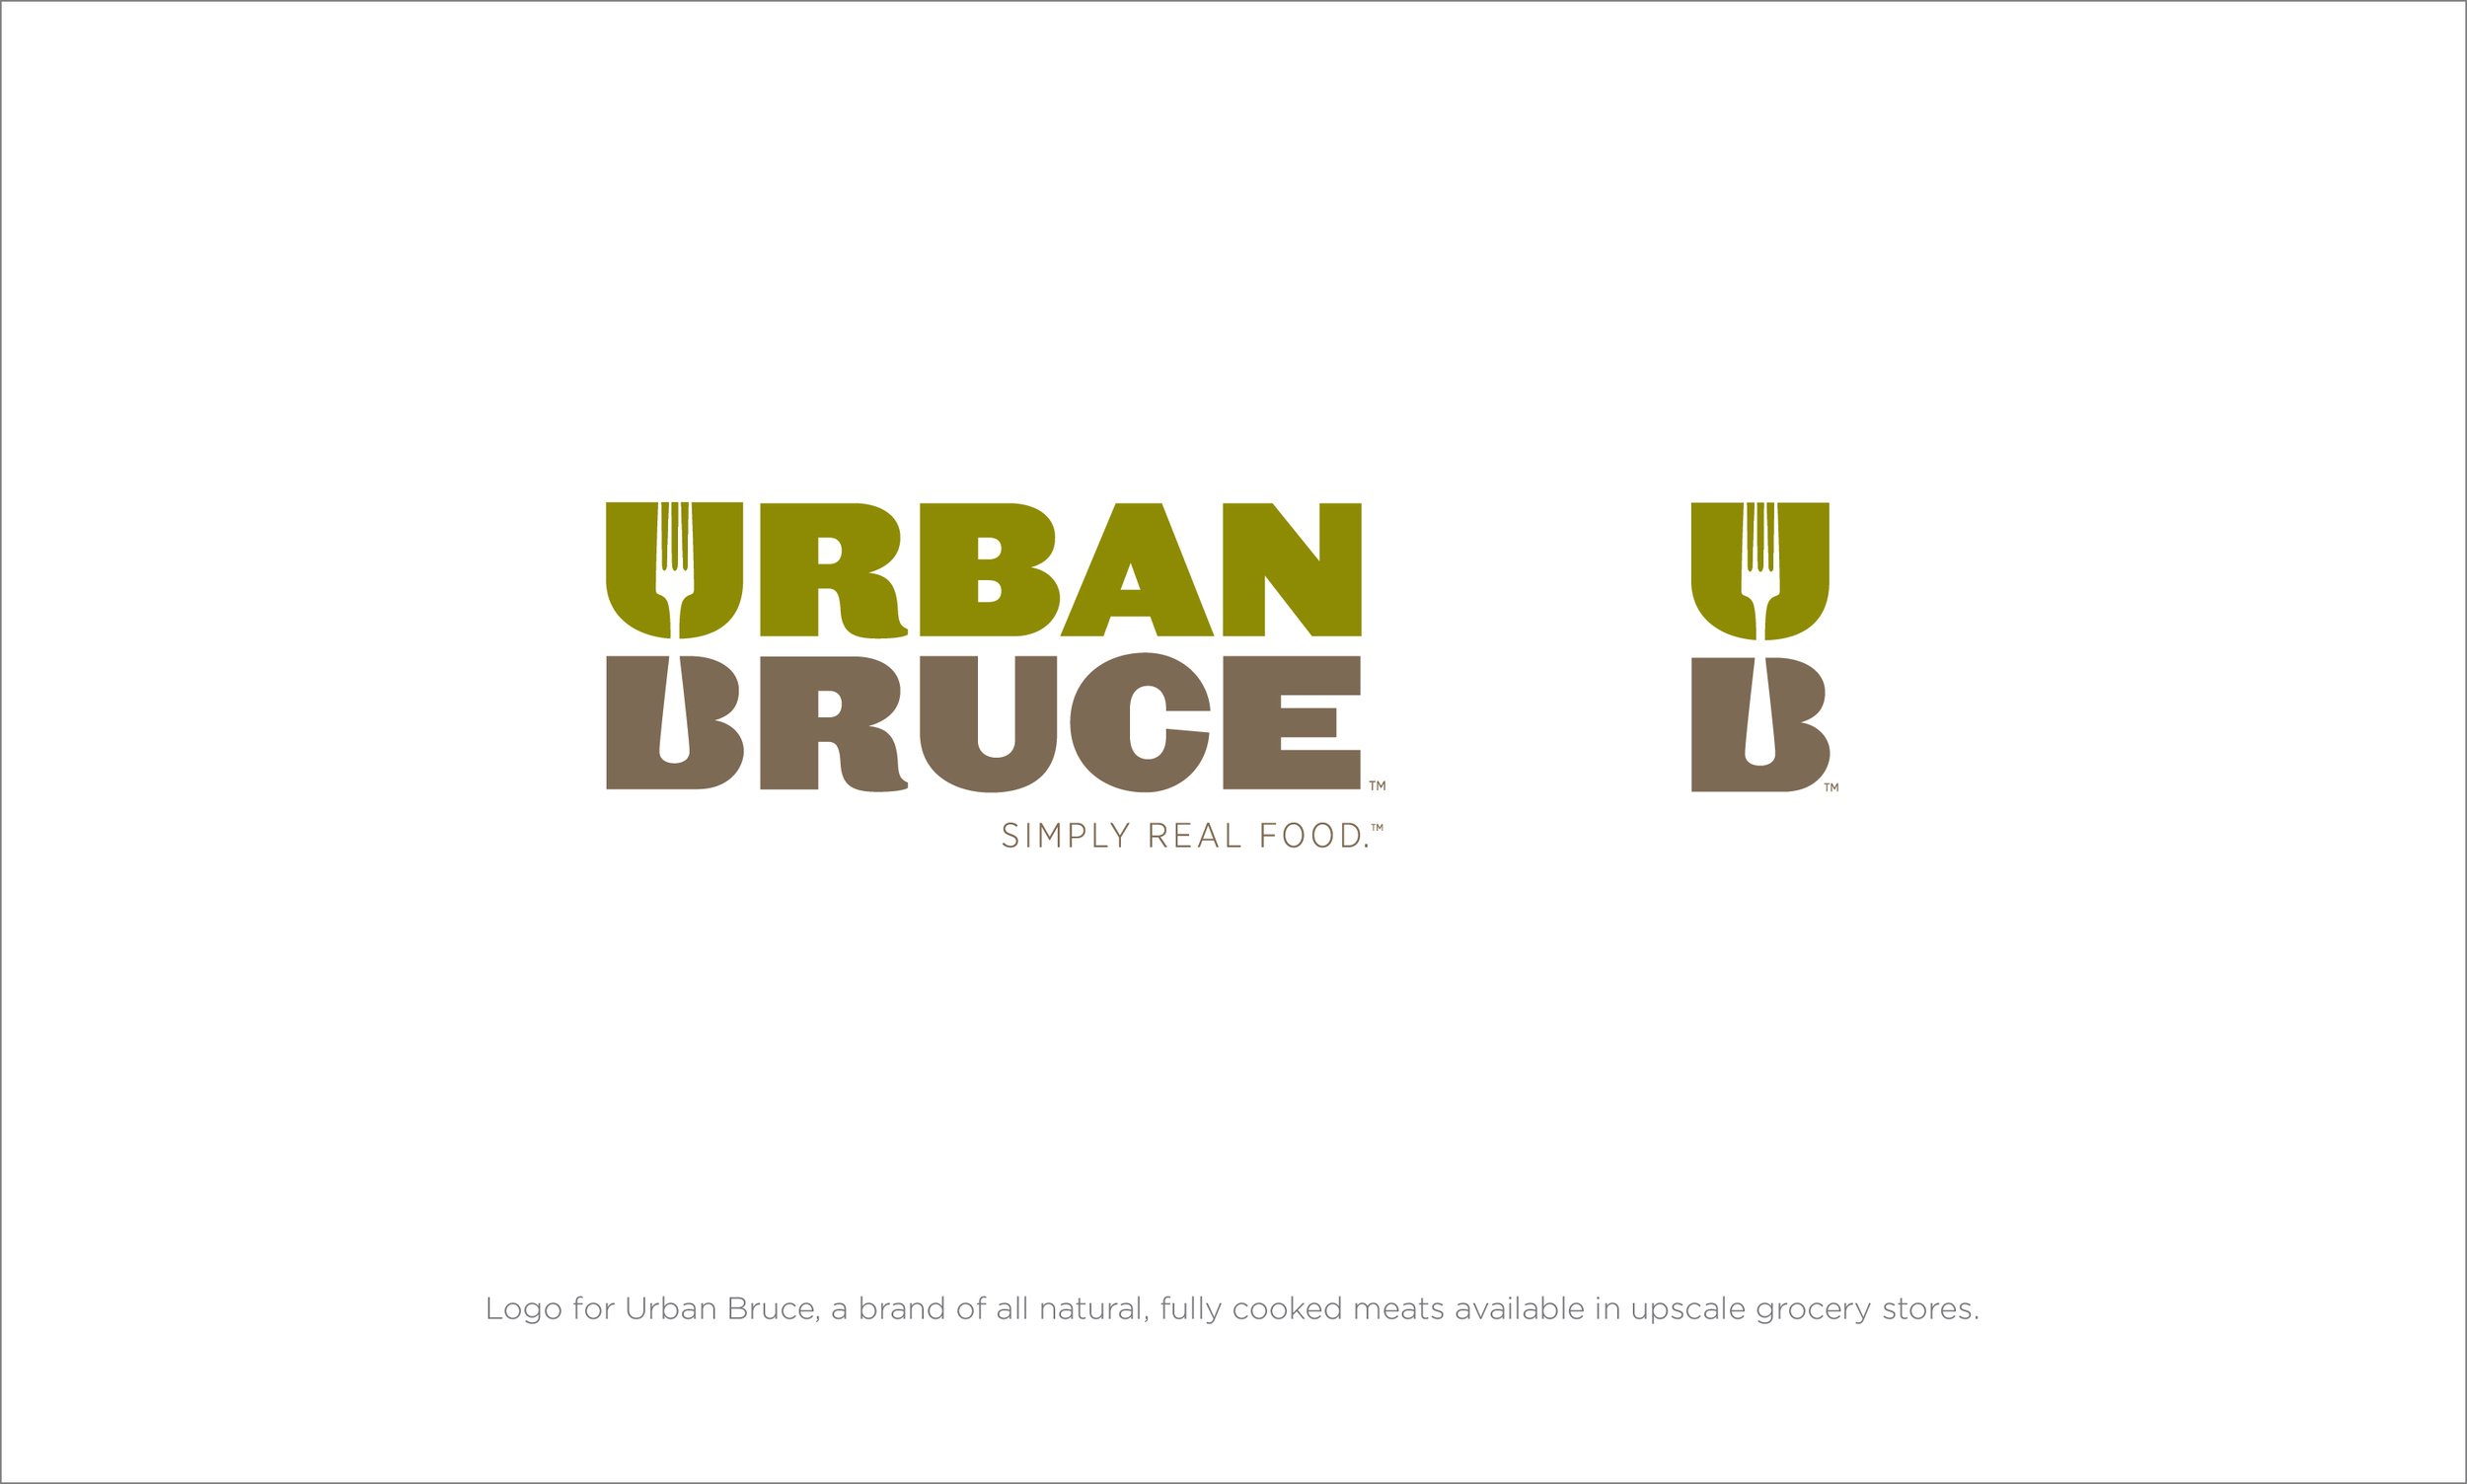 Urban Bruce